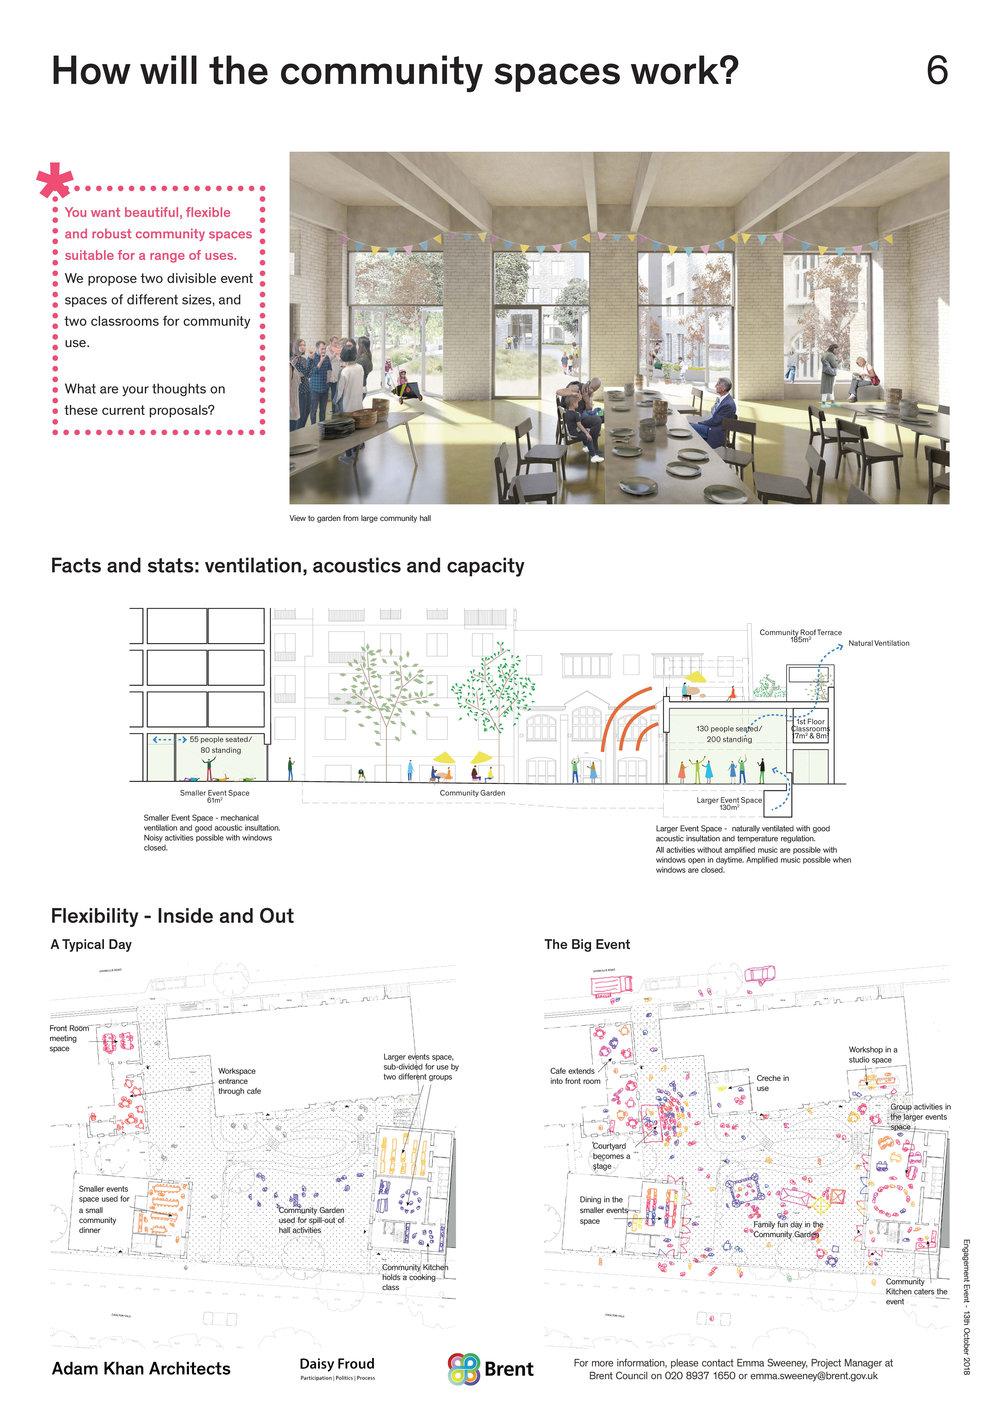 181009_Public-Consultation-03_LN_Page_6.jpg